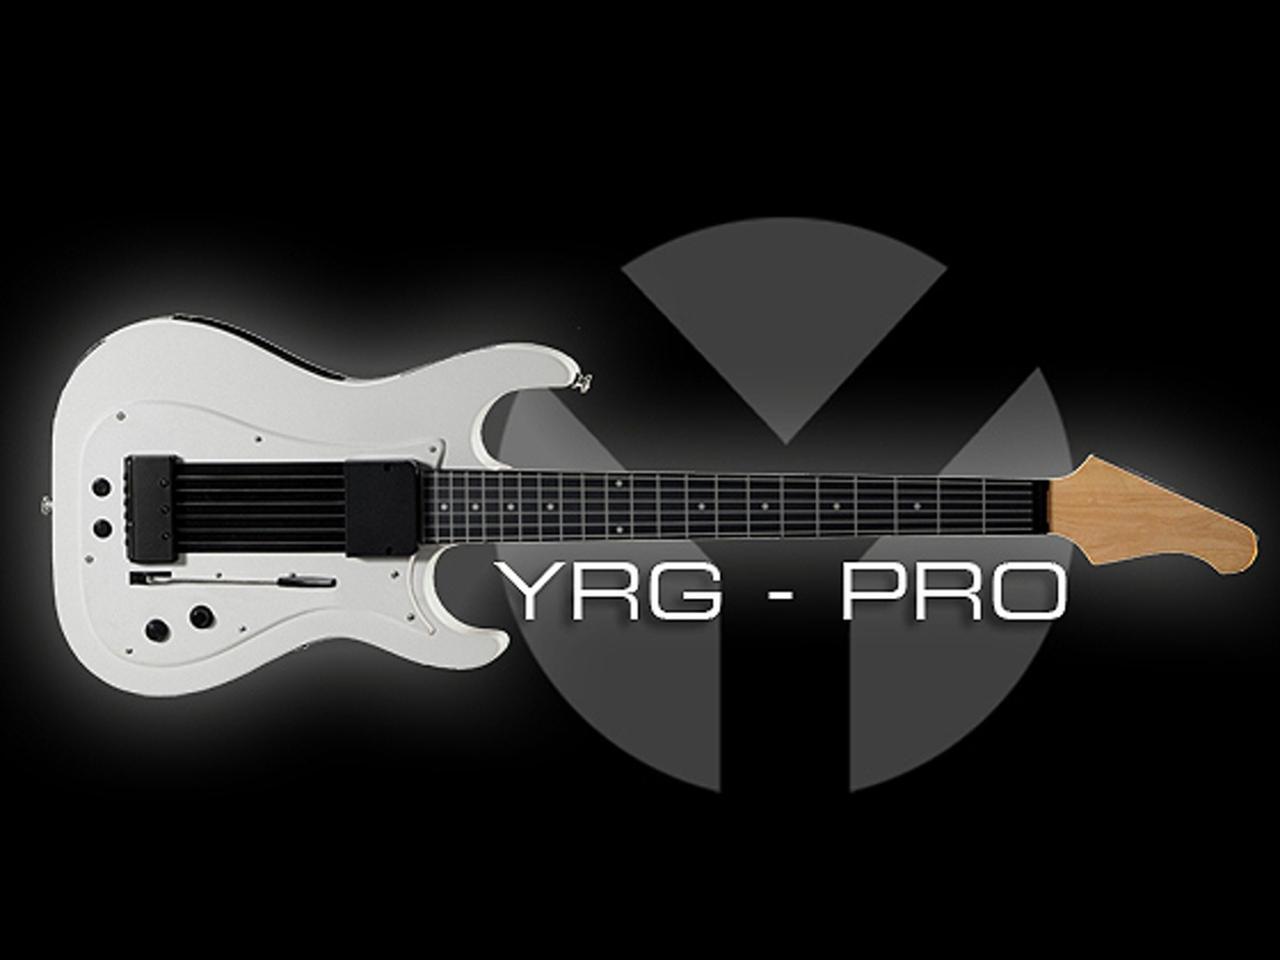 The original Kickstarter campaign image for the YRG-Pro MIDI Guitar. This idea later evolved into the Lineage MIDI Guitar